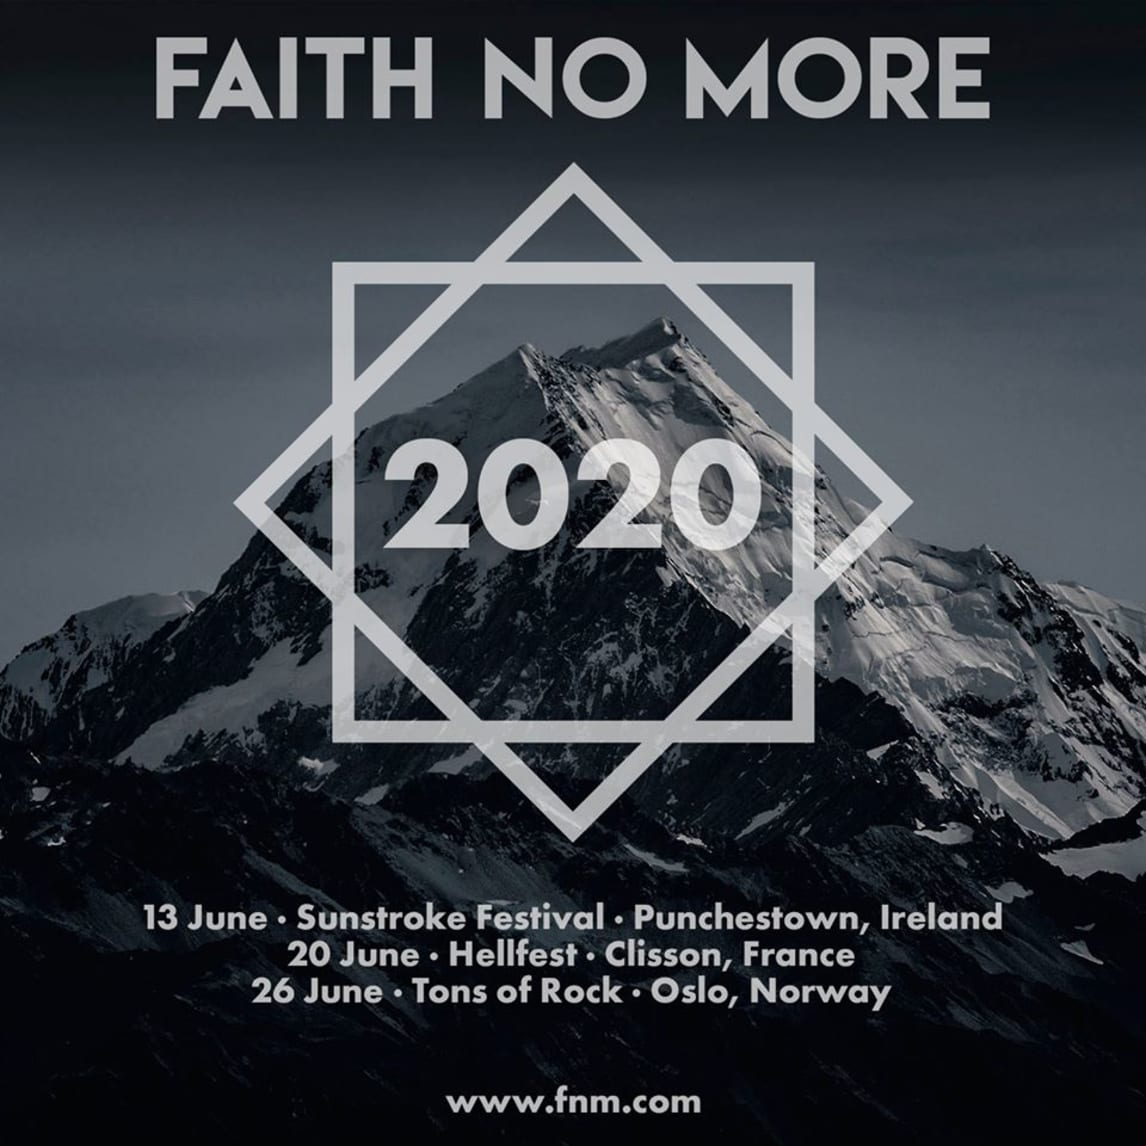 https://res.cloudinary.com/dhh19fozh/w_382,c_fit,dpr_3.0,q_auto,f_auto/jb7production-uploads/2019/11/faith-no-more-2020.jpg